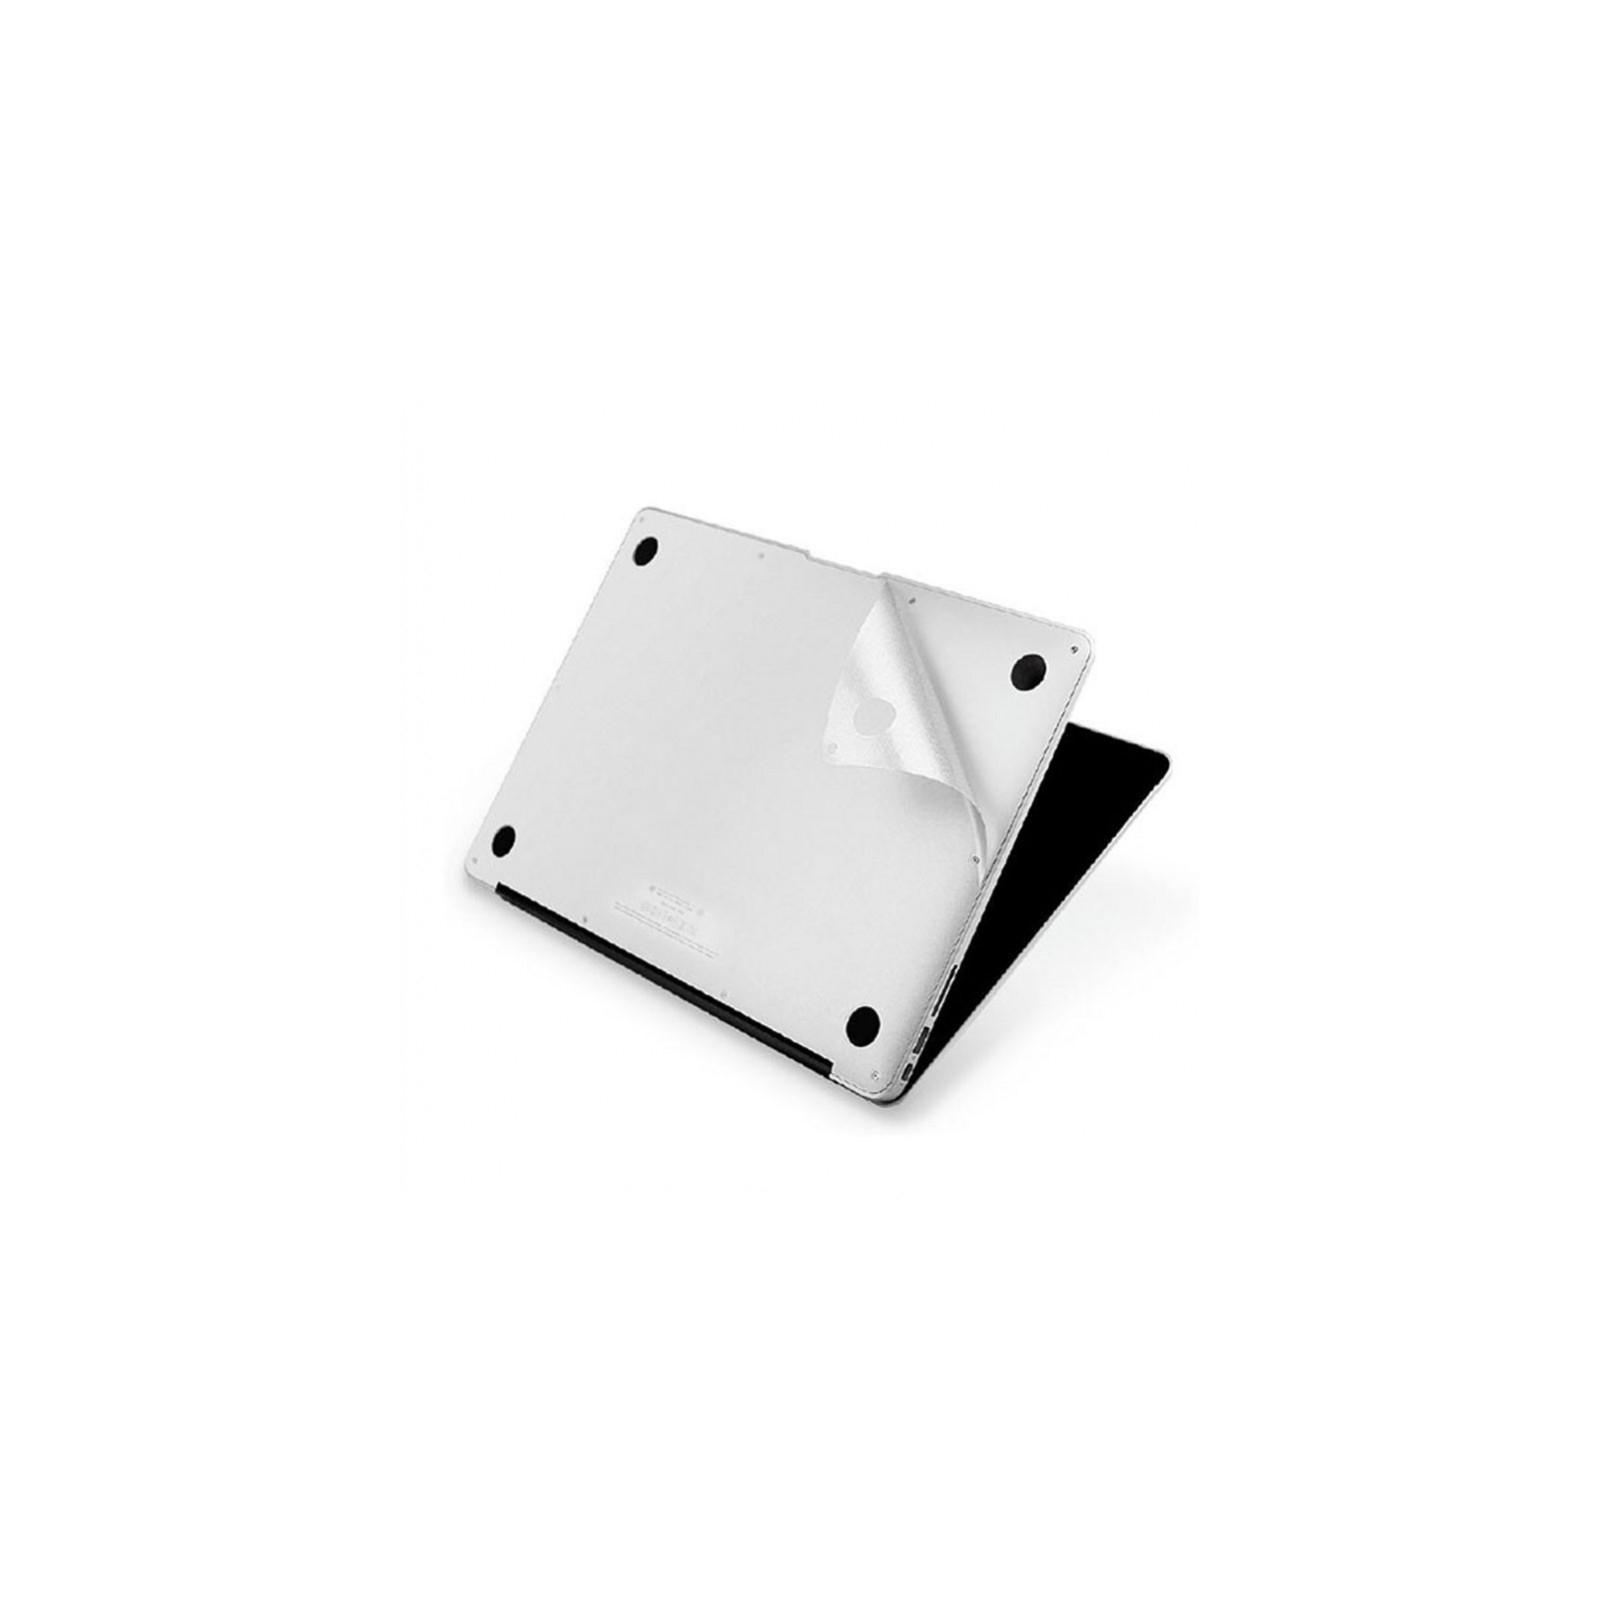 Пленка защитная JCPAL 3 in 1 set для MacBook Air 13 (JCP2044) изображение 4